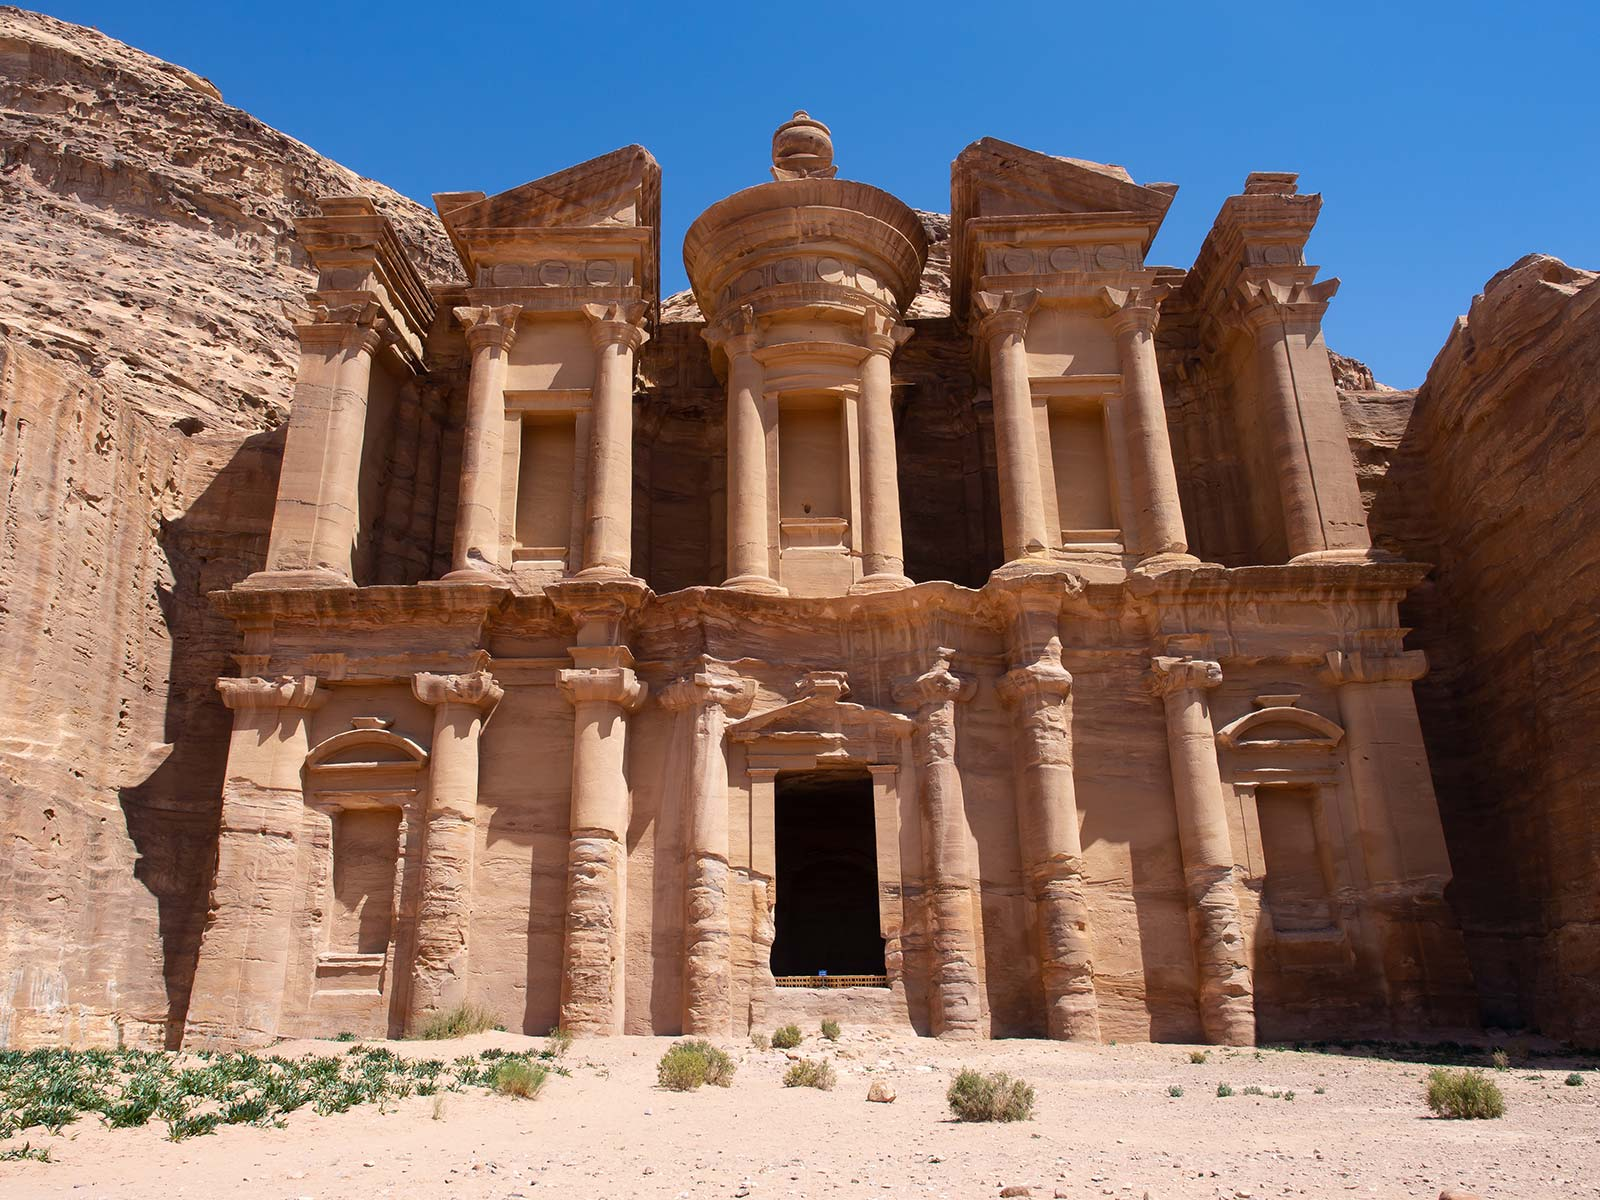 Kloster Ad Deir, Petra